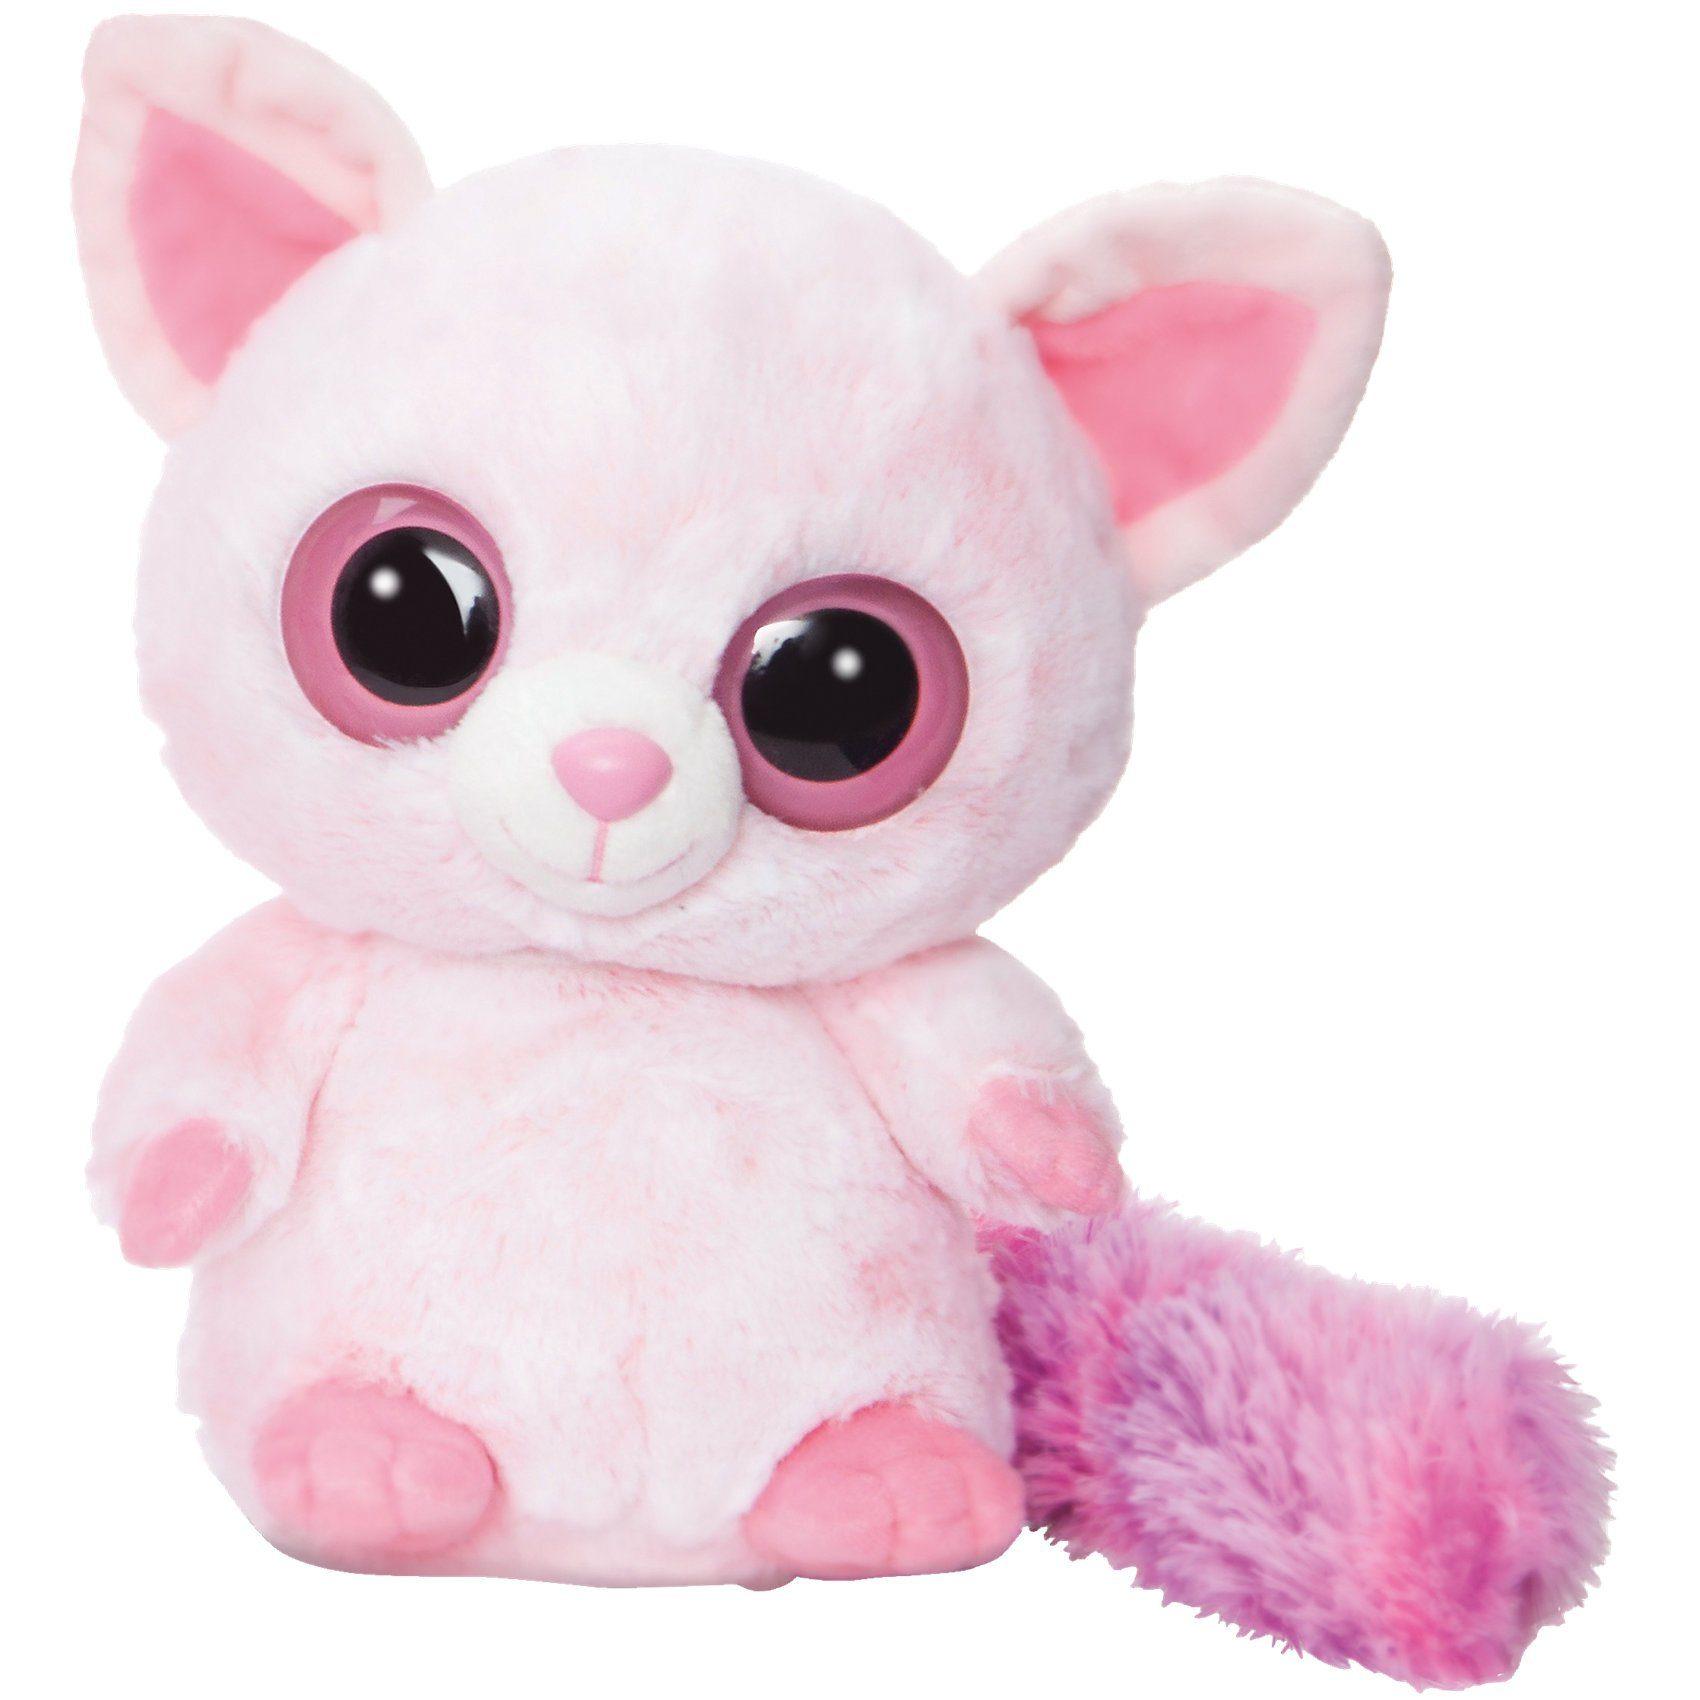 YooHoo Baby Pammee rosa 40cm